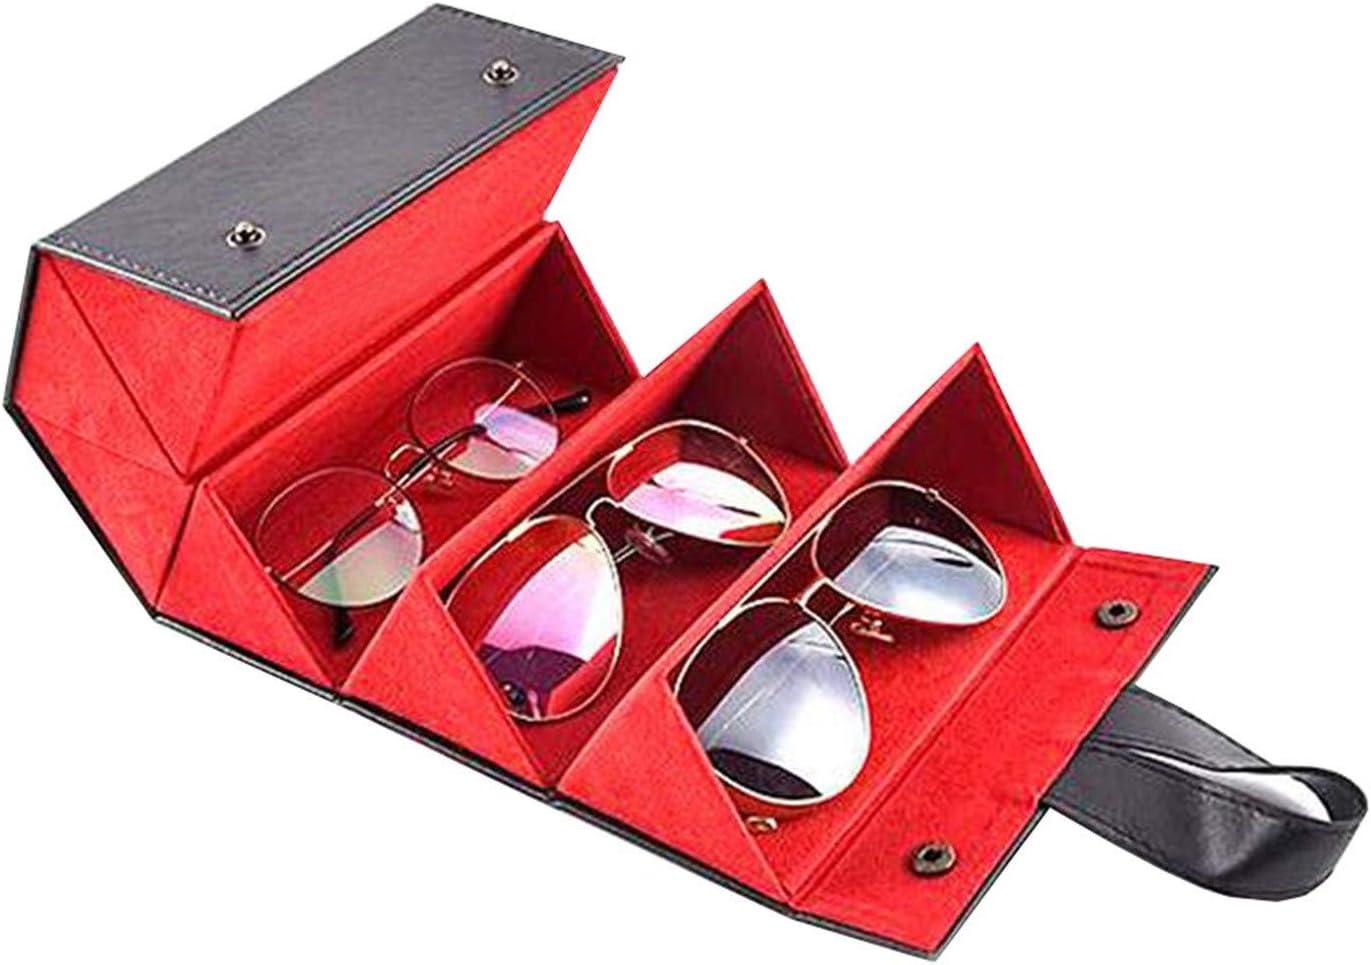 S5E5X 5-Slot Travel Sunglasses Organizer Collector Black Multiple Leather Sunglasses Case Foldable Eyeglasses Storage Box Hanging Eyewear Holder